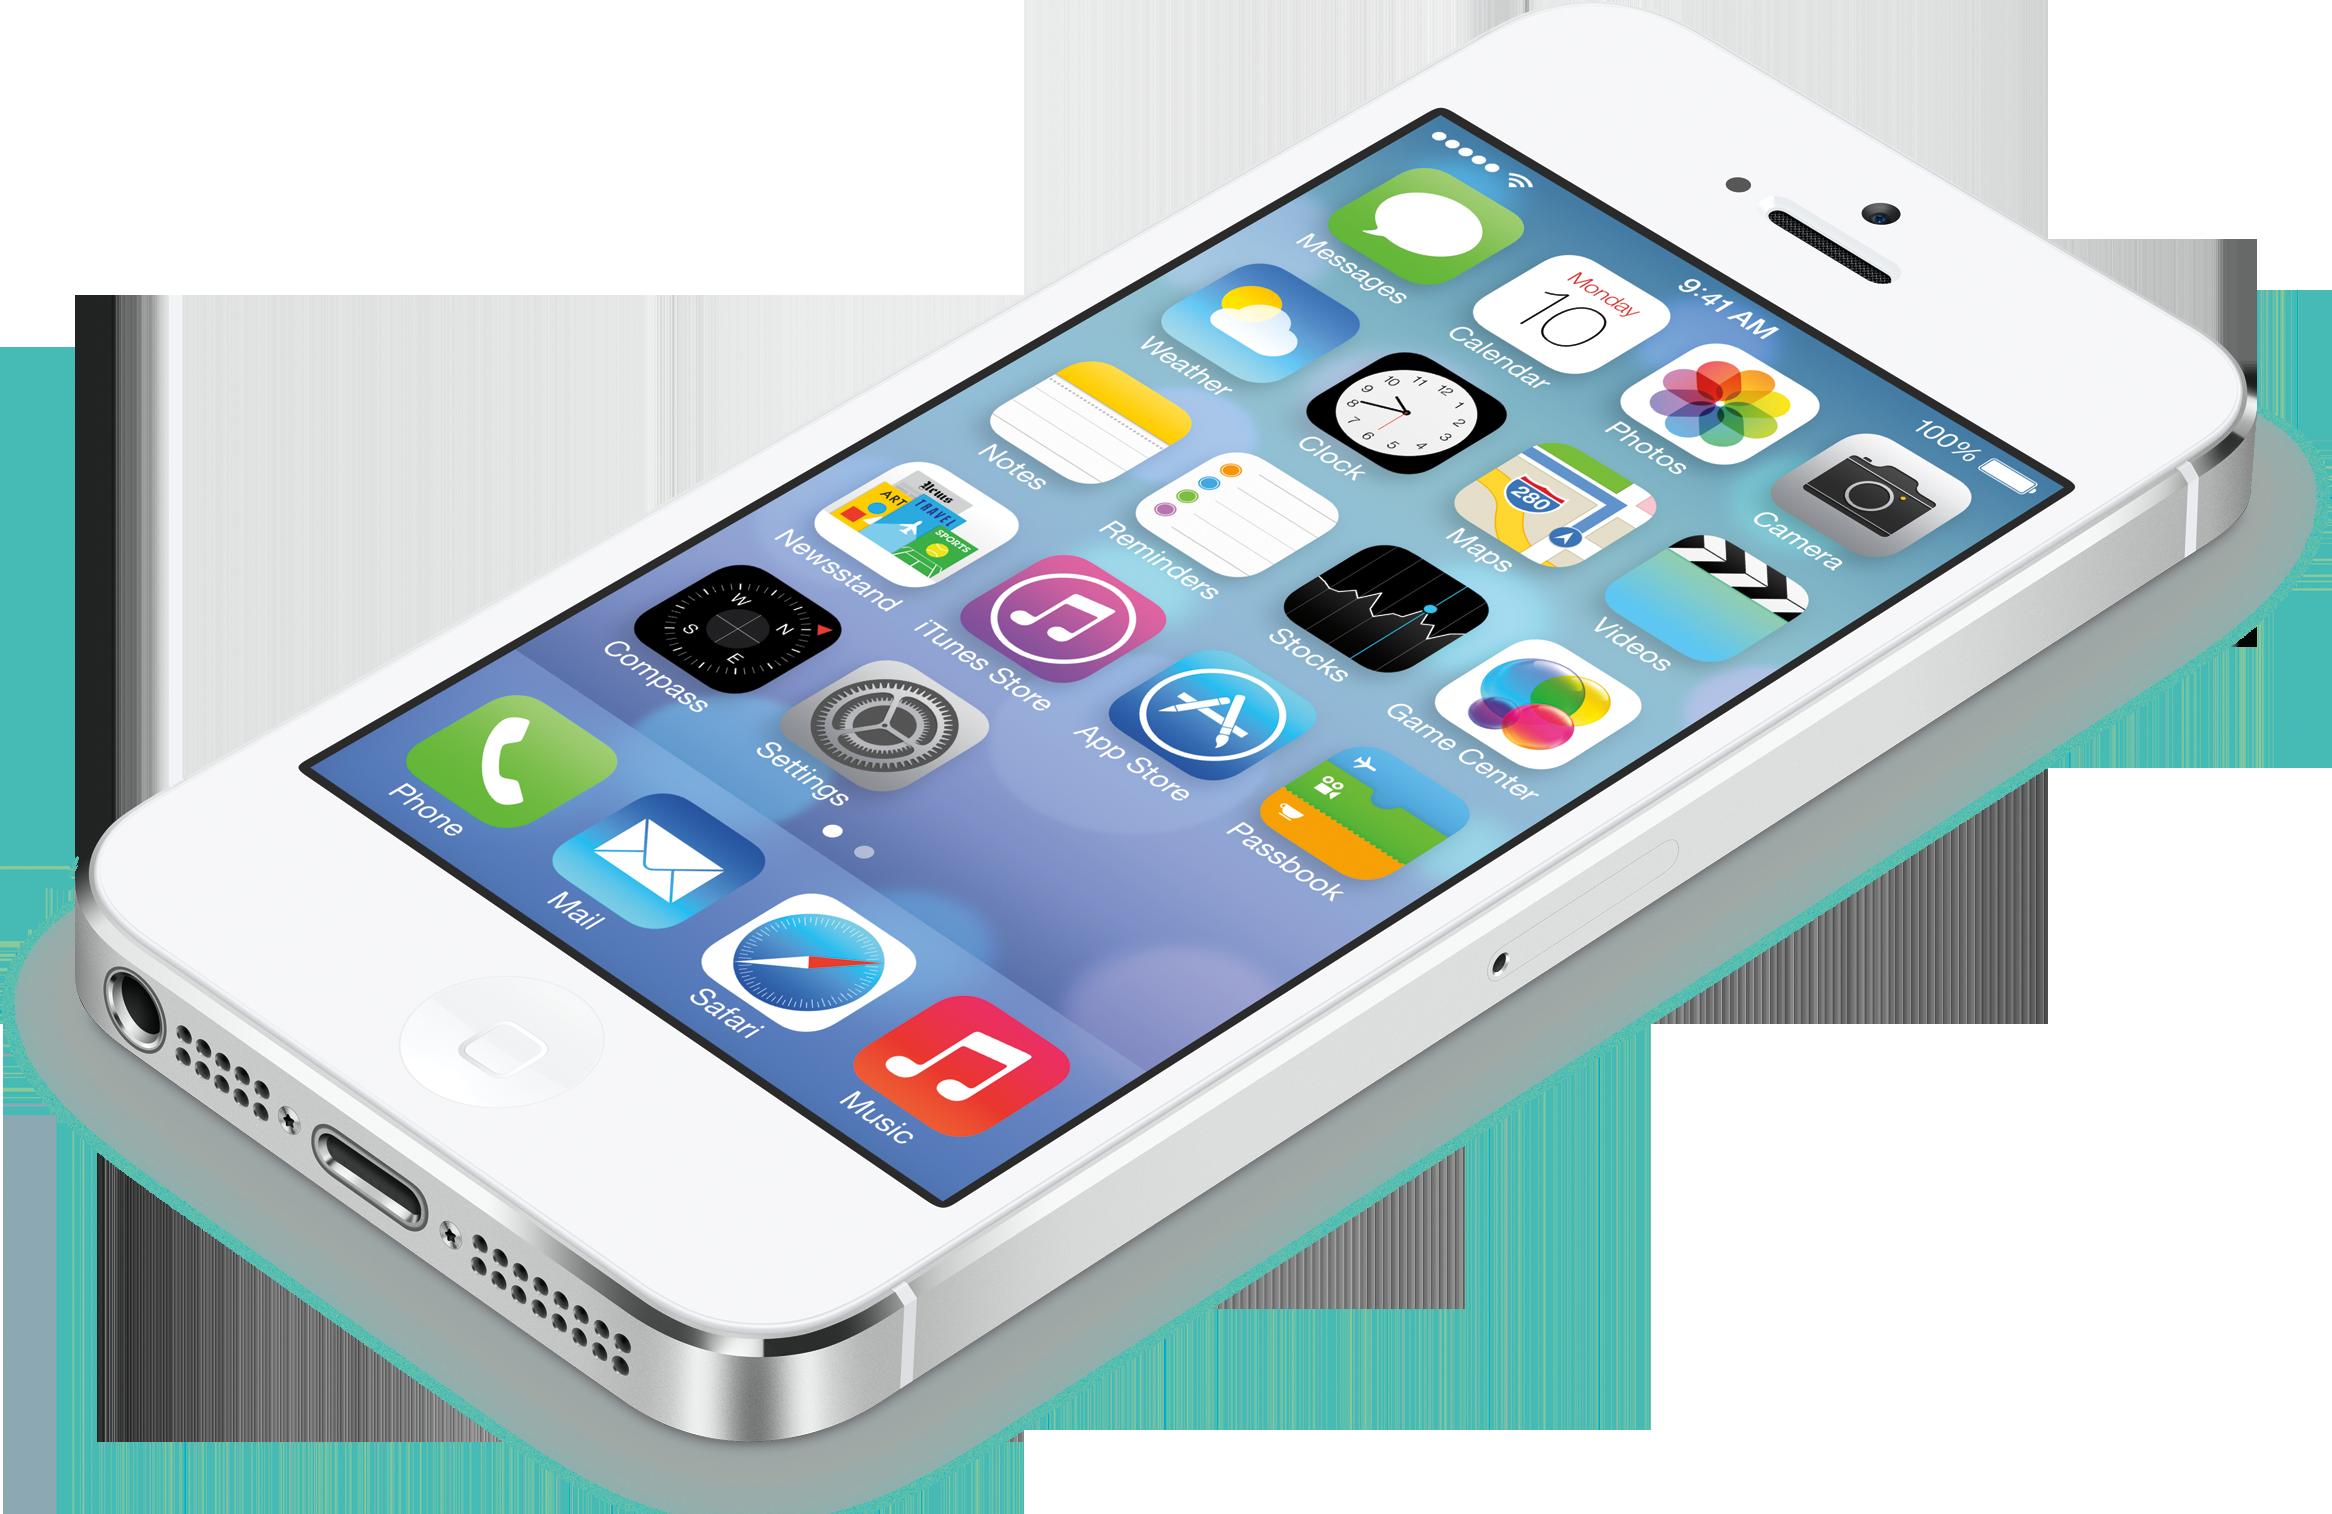 iOS 7 num iPhone 5 branco deitado e de lado